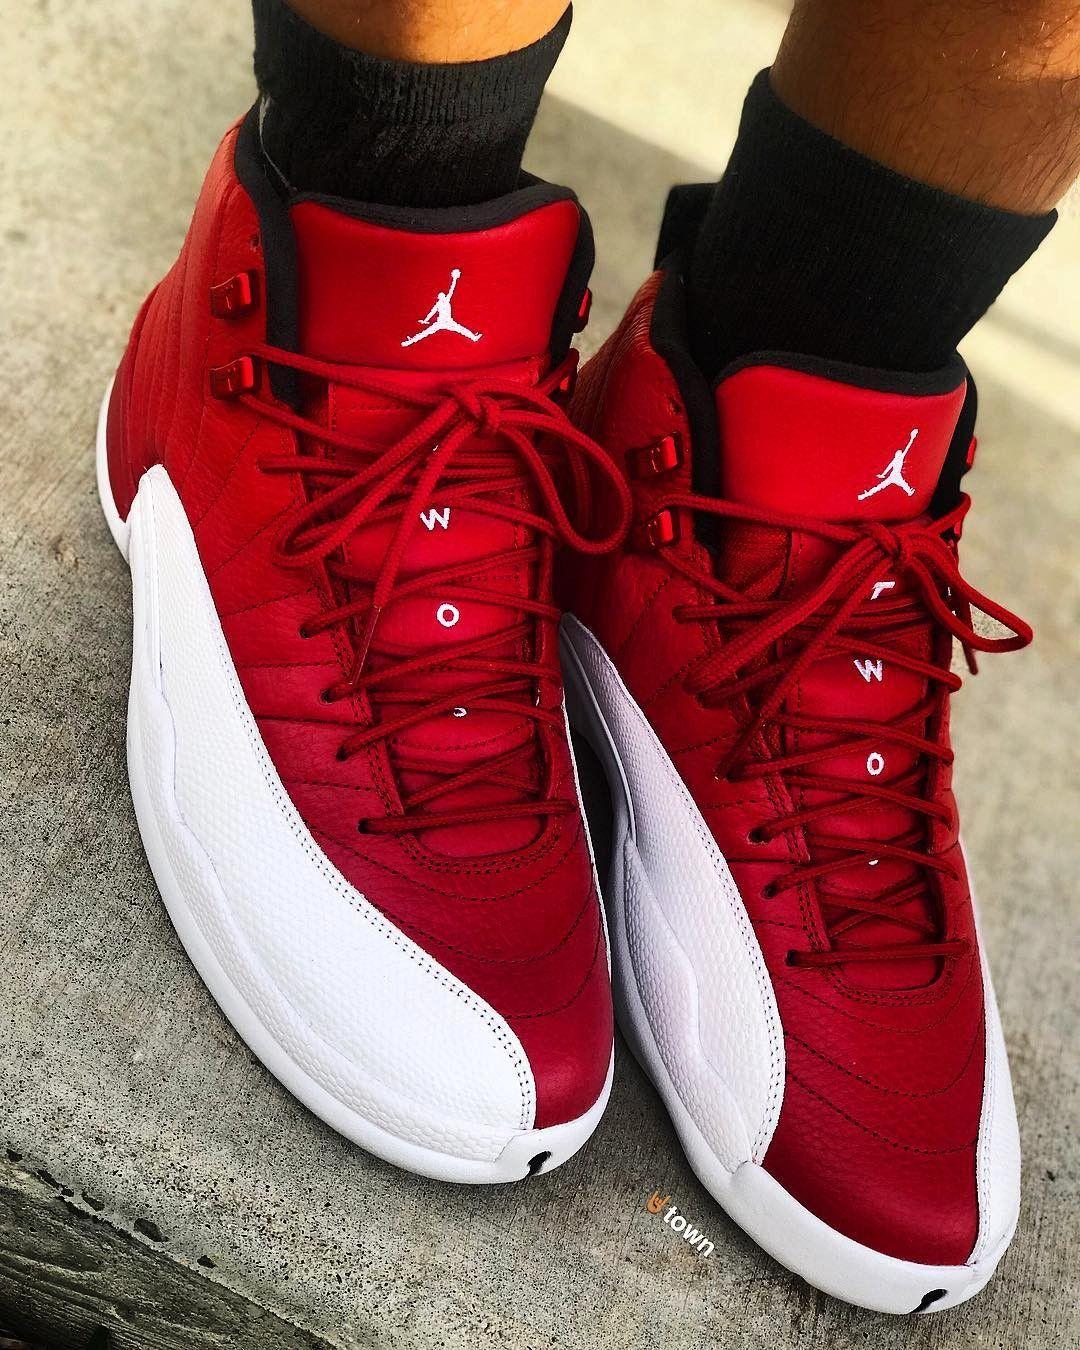 Jordan 12 | Calzado nike gratis, Zapatillas nike jordan ...